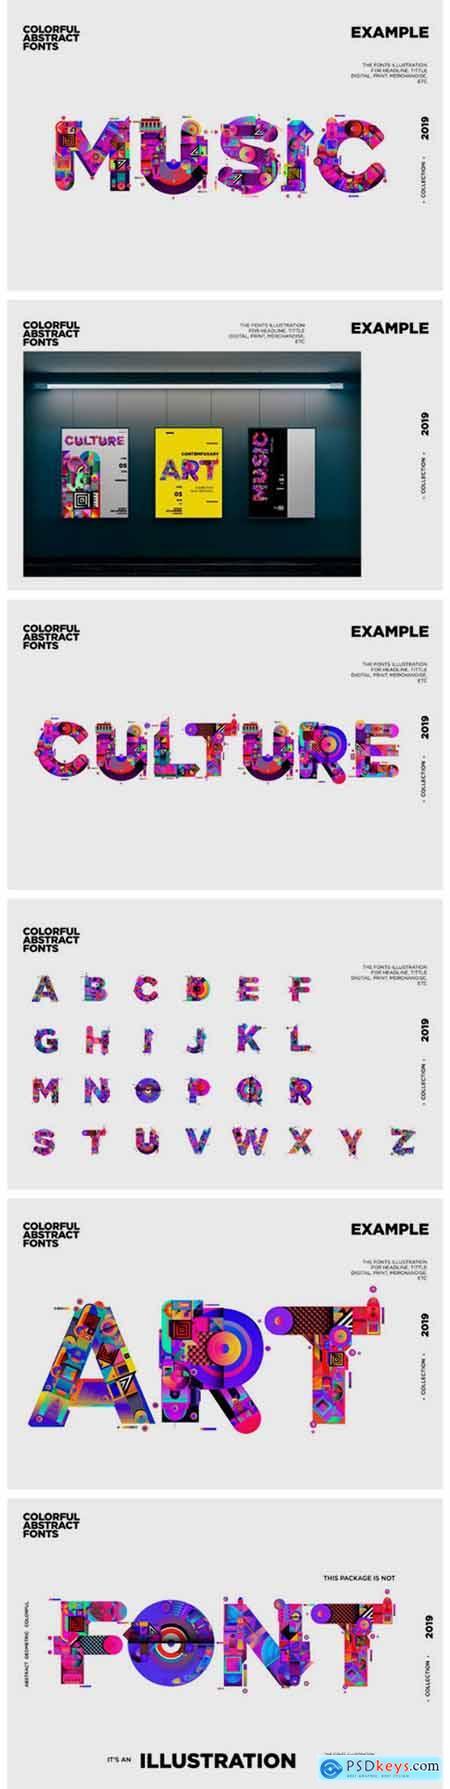 Colorful Alphabets Font Illustration 2296583